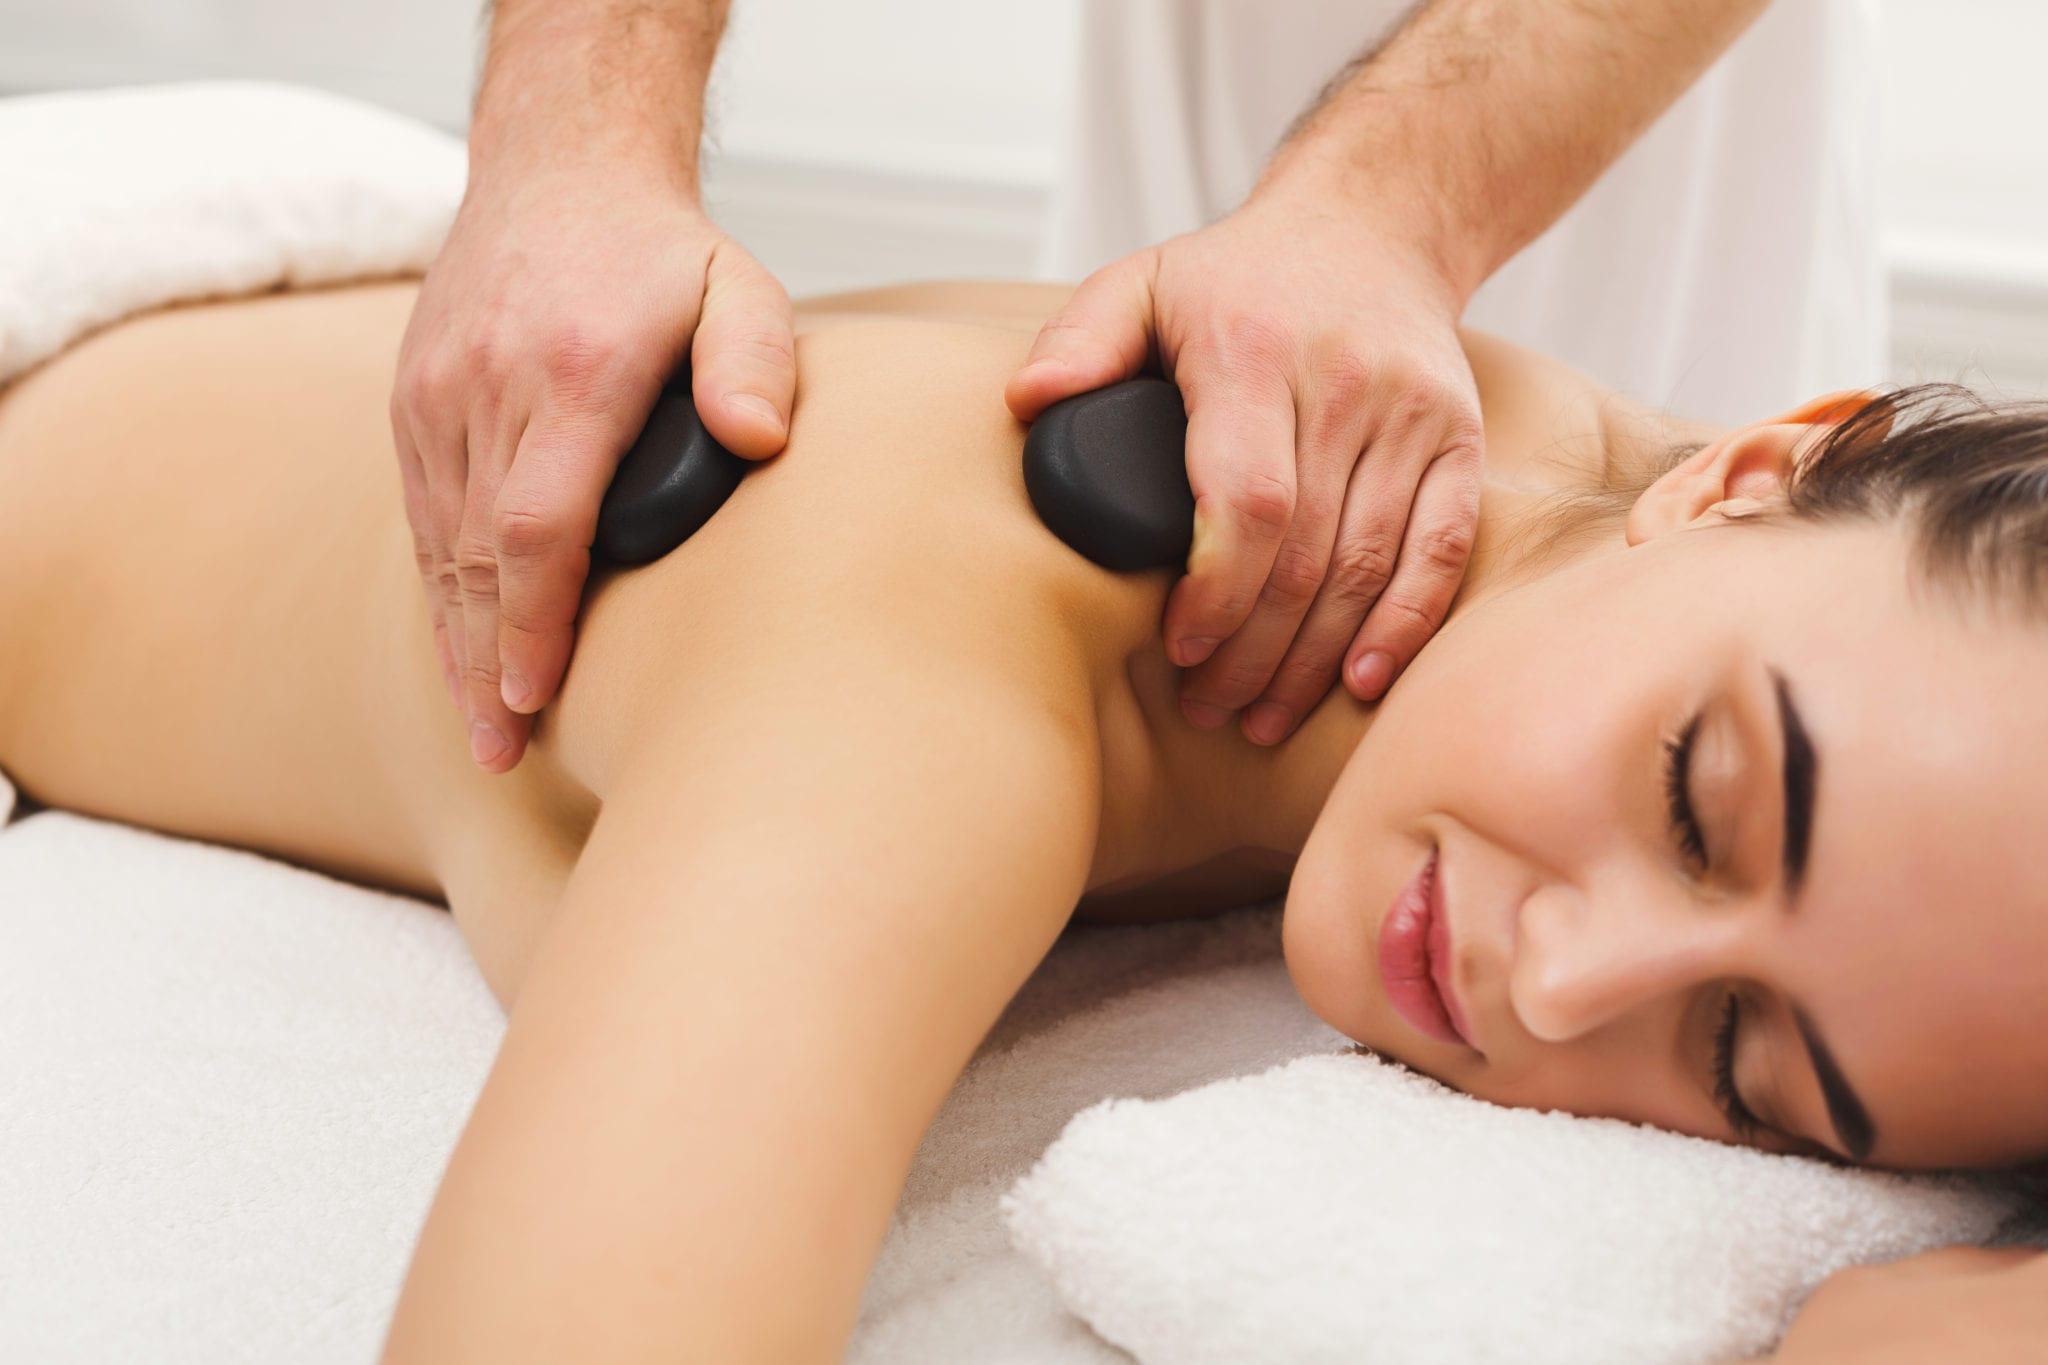 Woman getting hot stones massage at spa salon